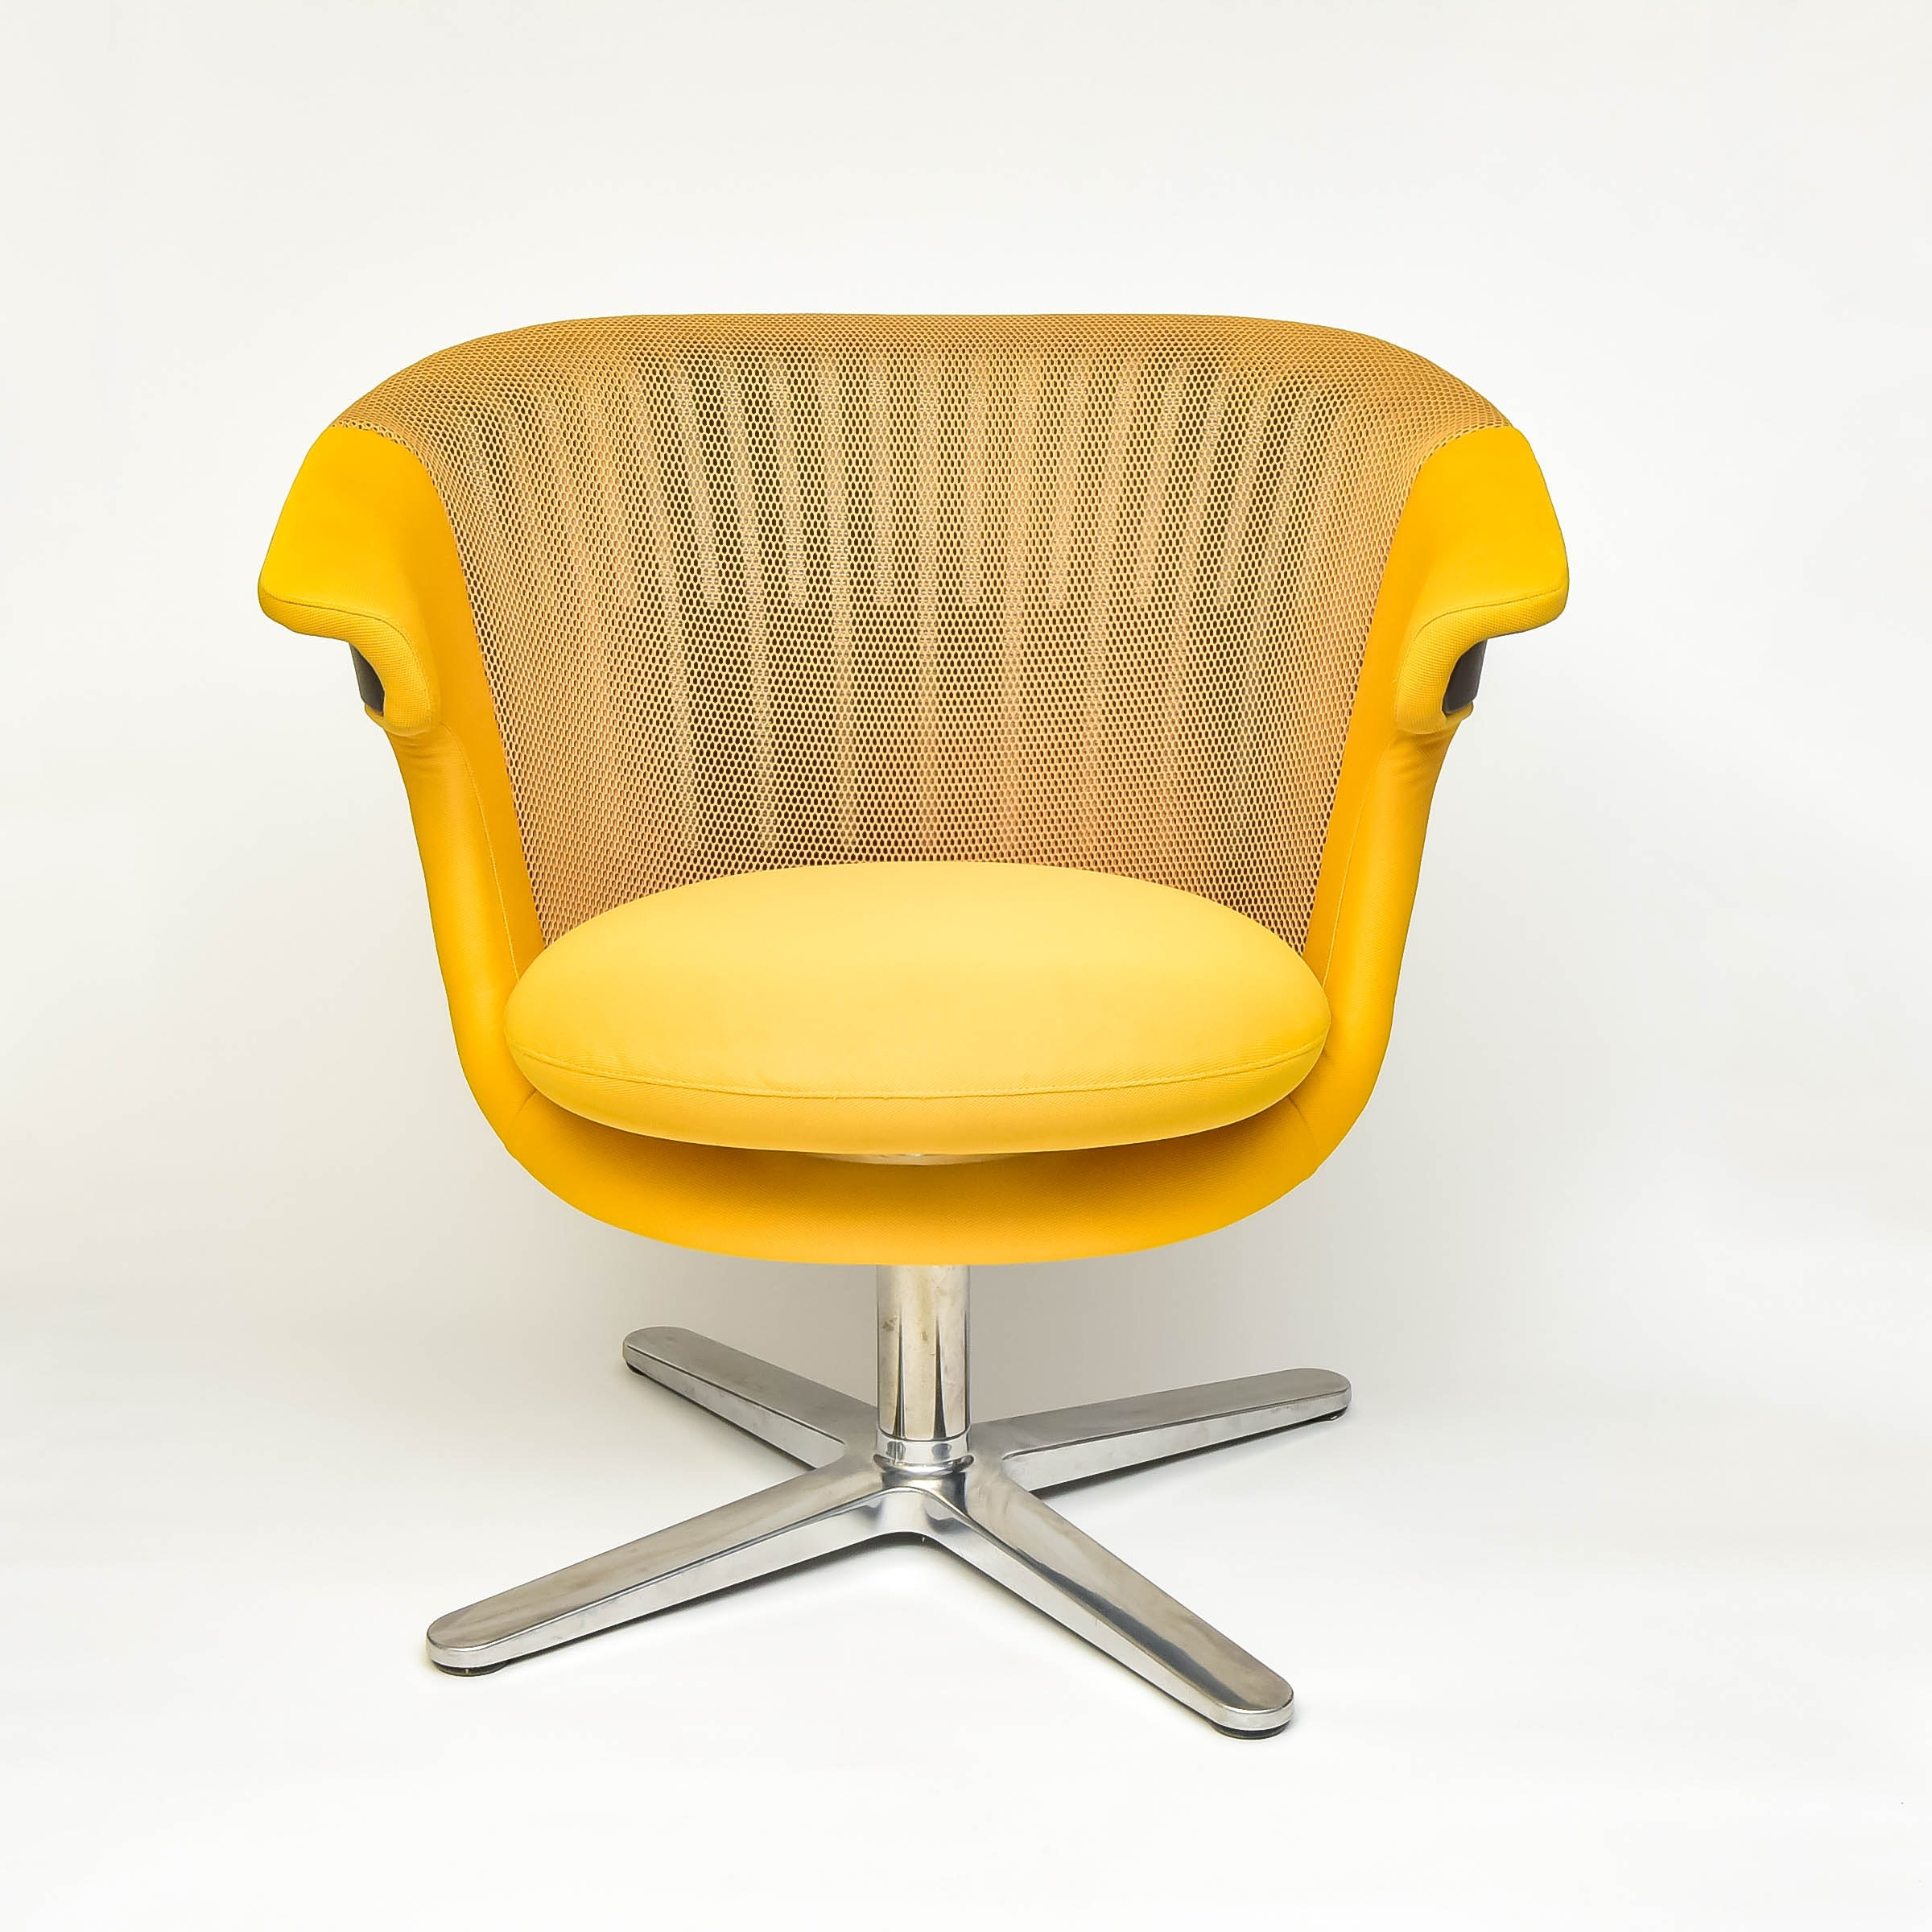 Delightful Canary Yellow Steelcase I2i Ergonomic Chair